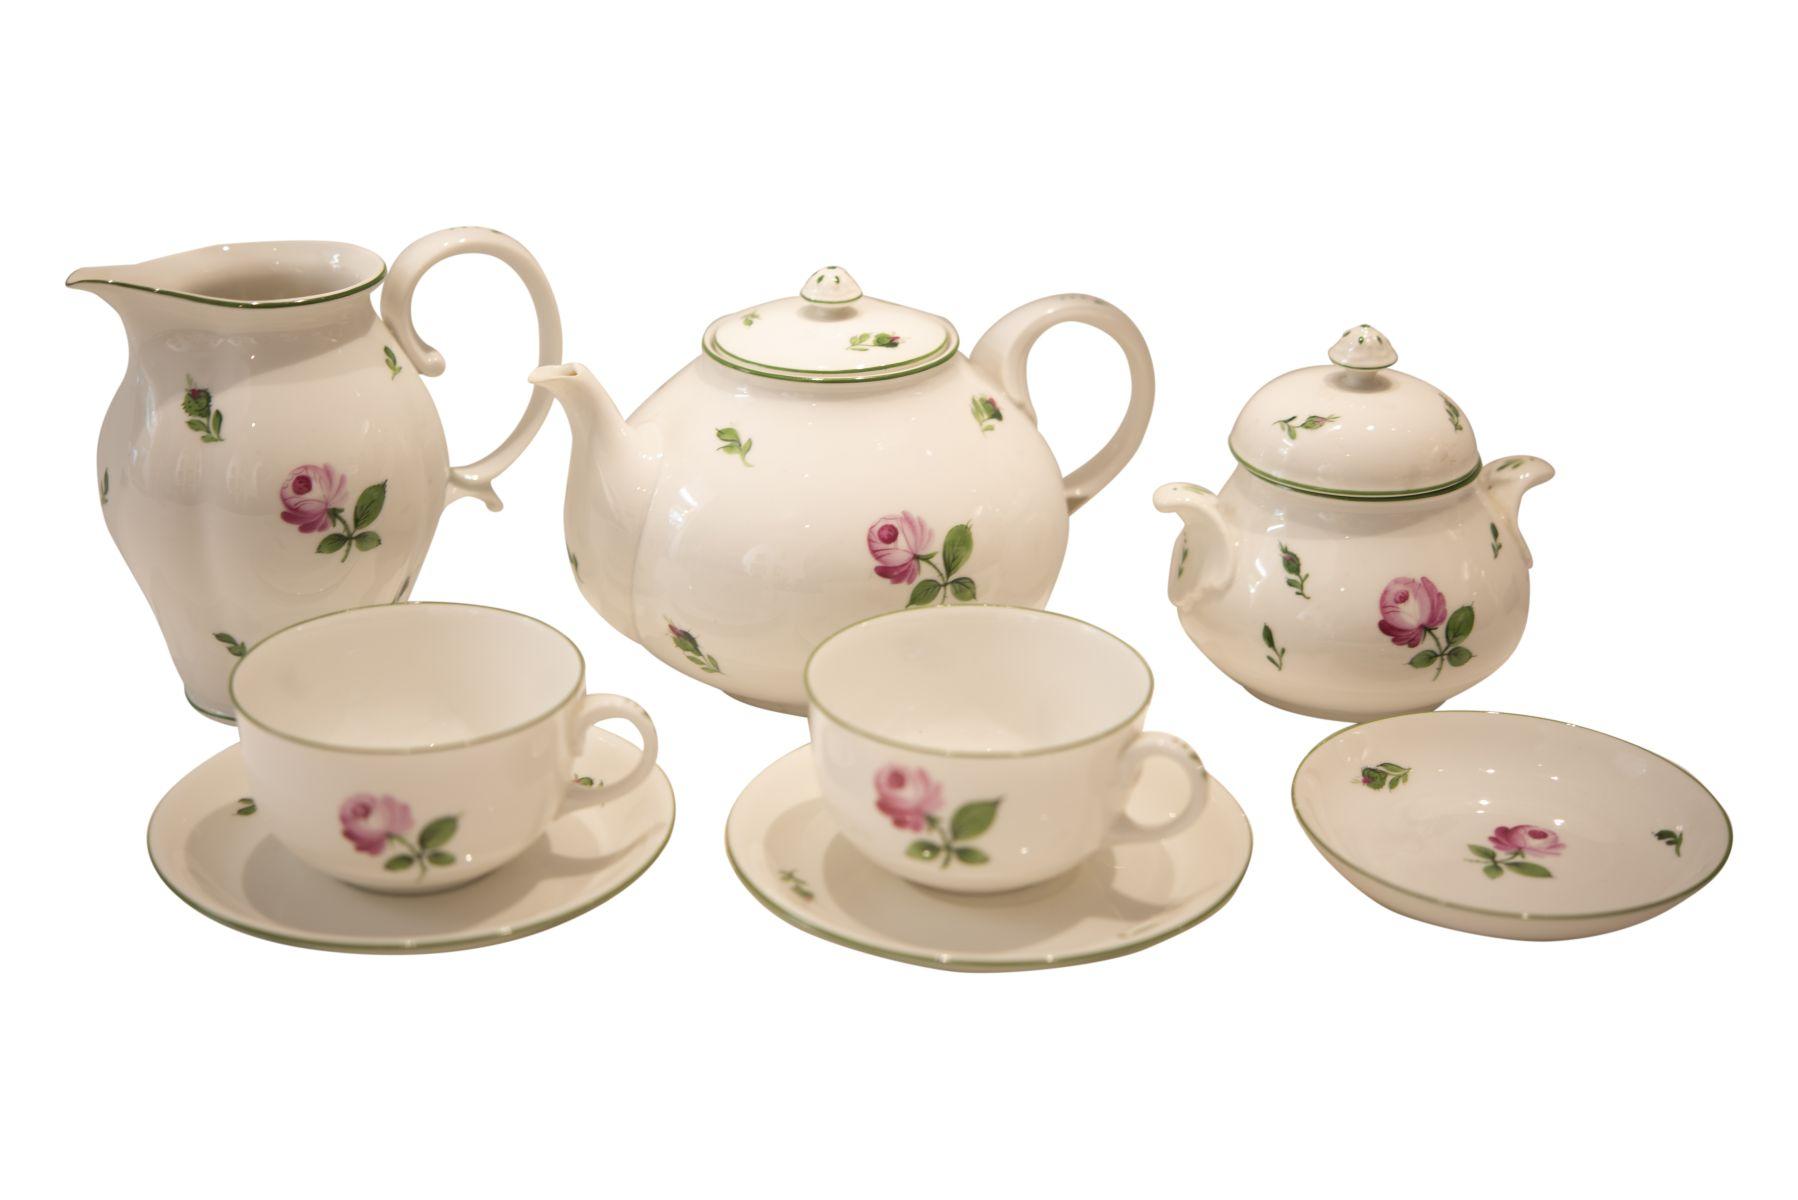 "#209 Tea service ""Viennese Rose"", Augarten | Tee Service ""Wiener Rose"", Augarten Image"